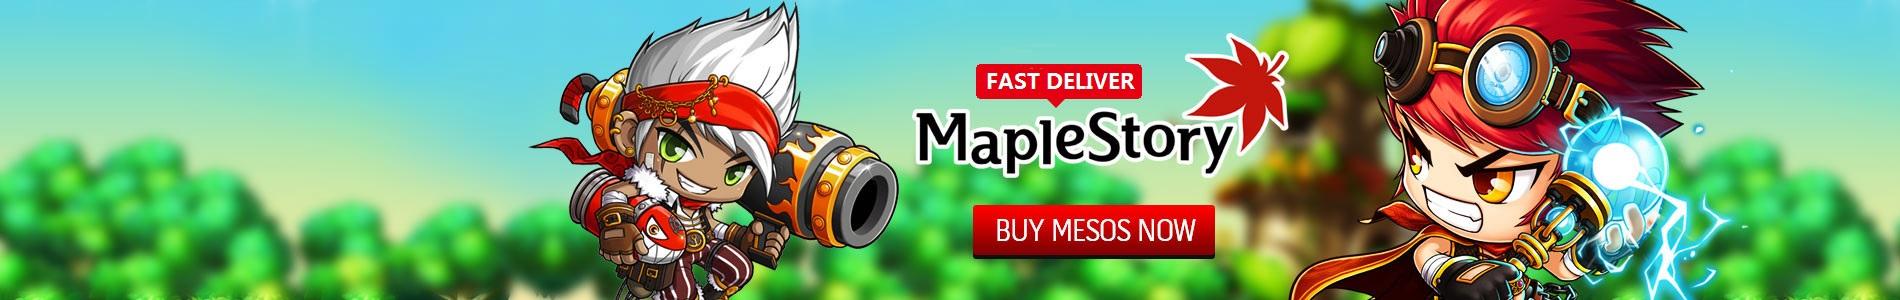 MapleStory Mesos - FIFA Coins - Pokemon GO Accounts - OGPal